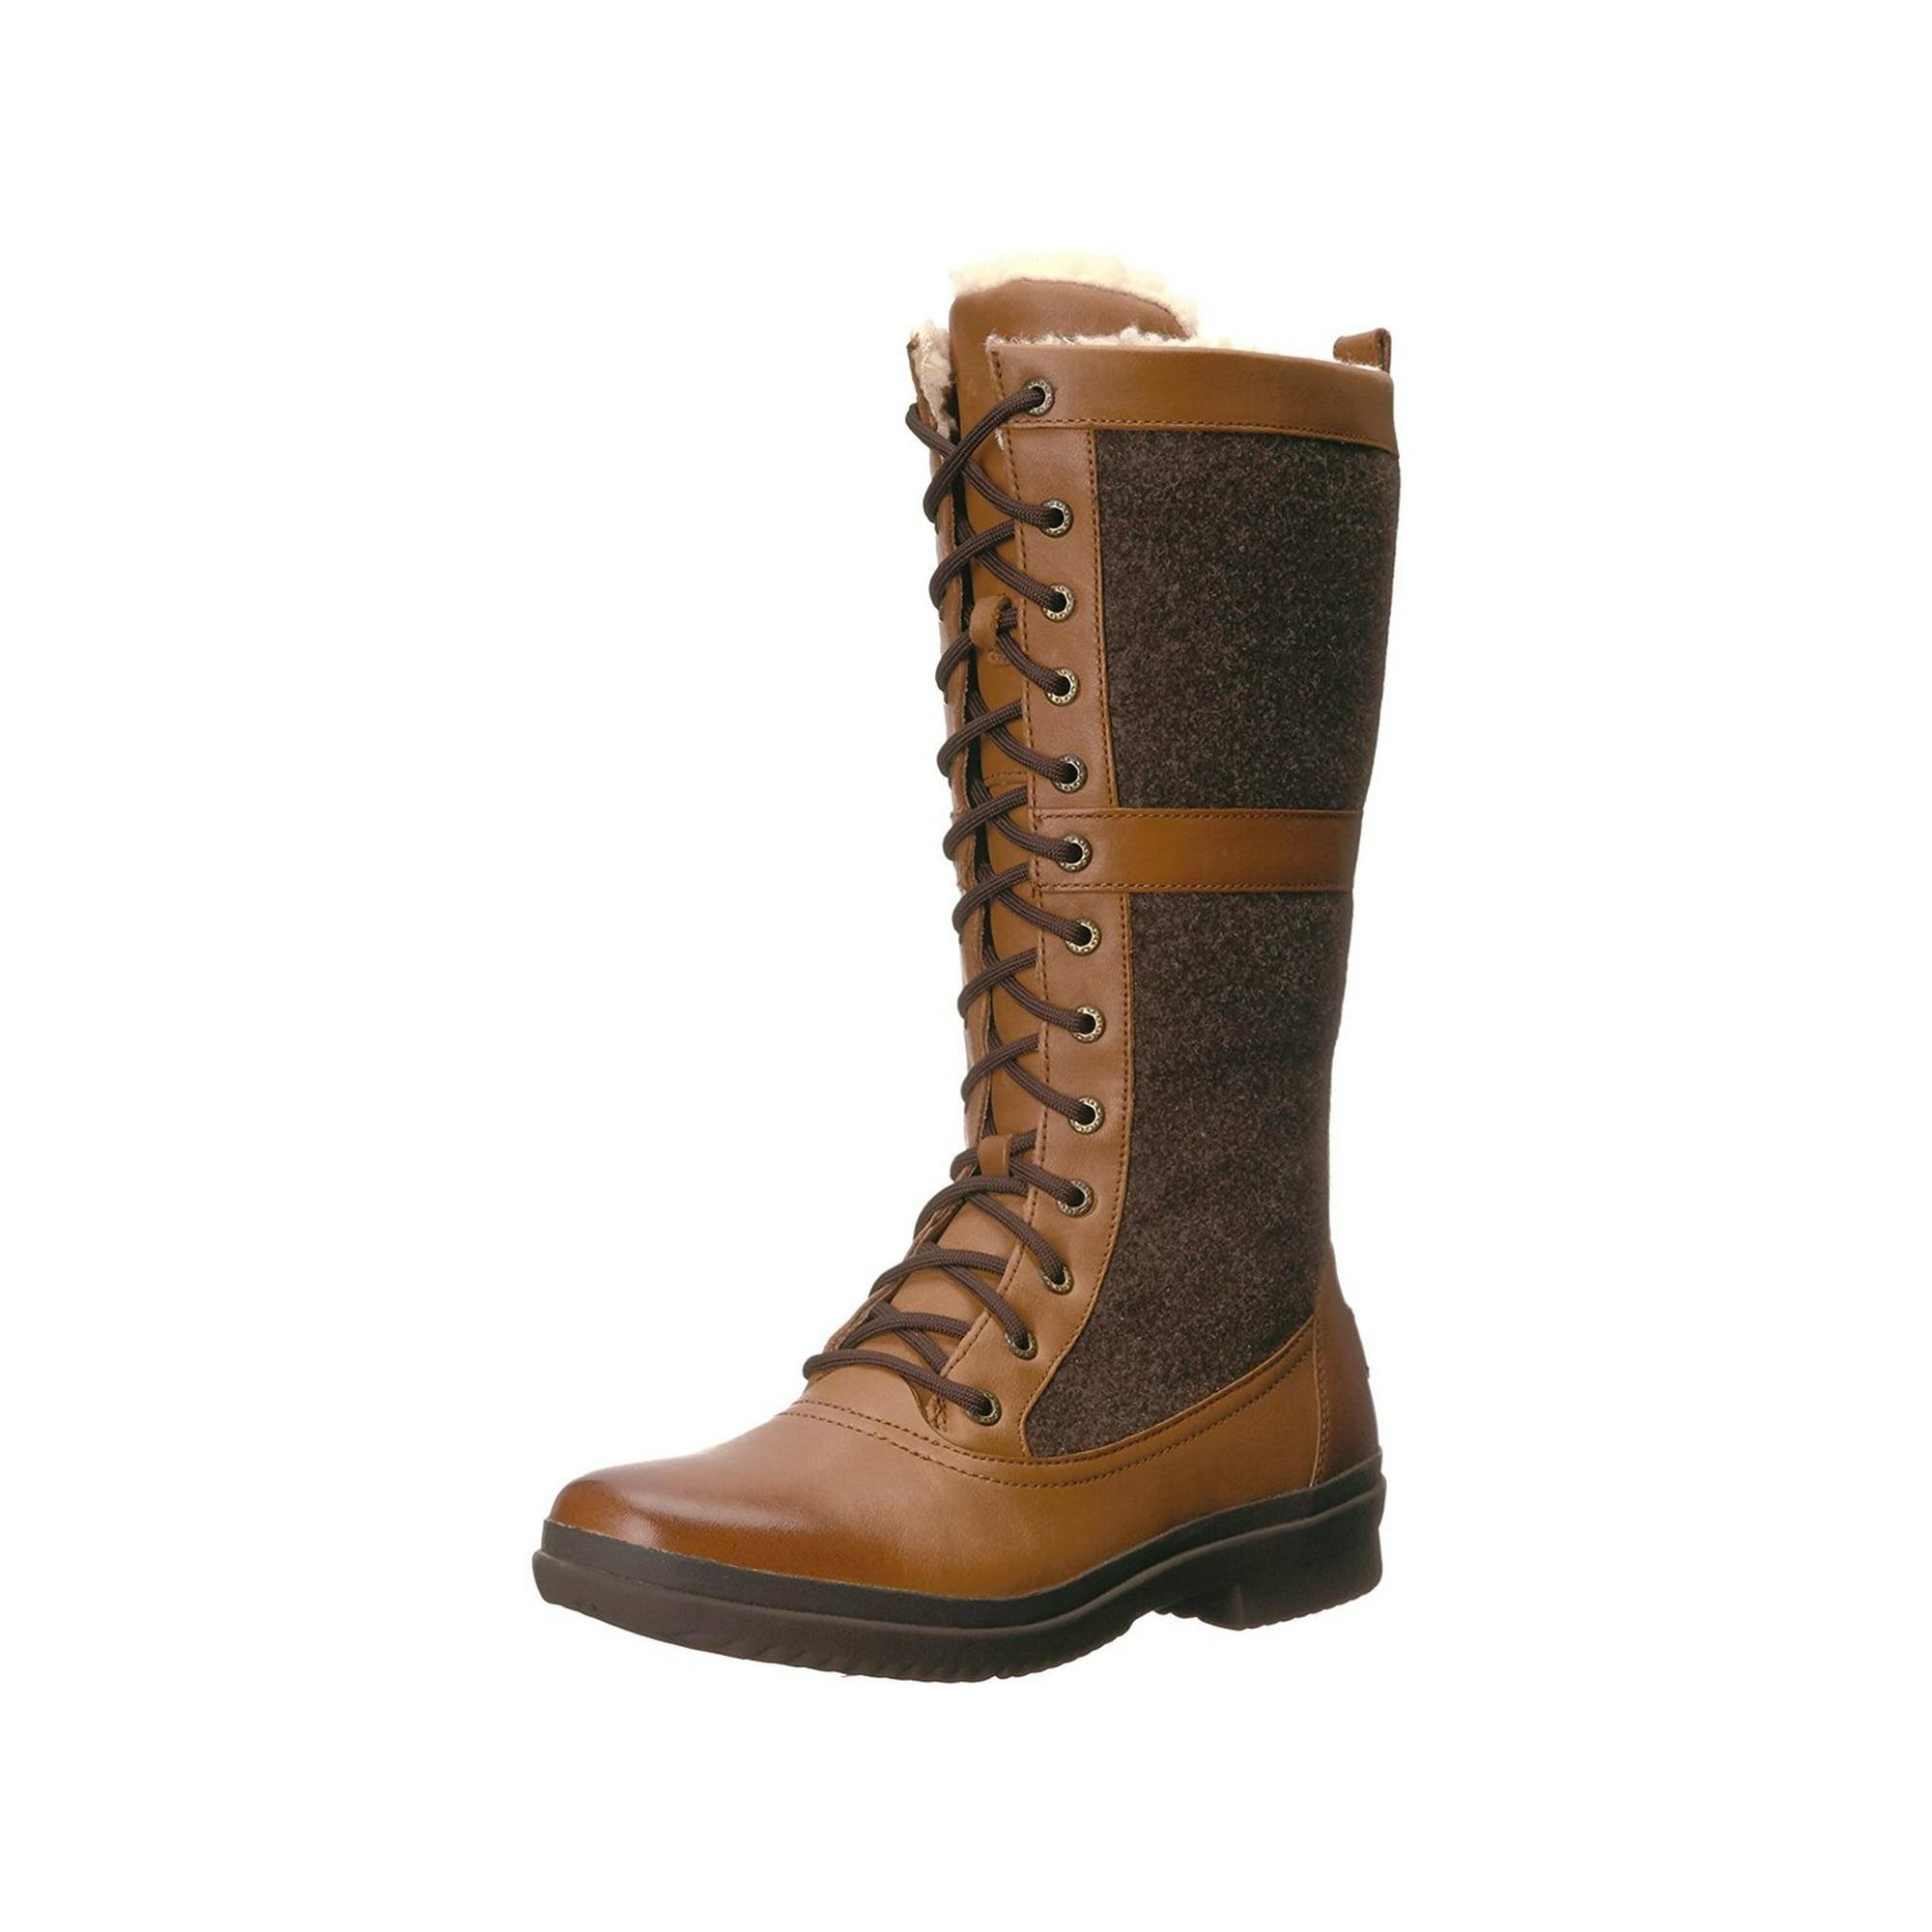 adcc4045e14 Ugg Australia Womens Elvia Leather Round Toe Mid-Calf Cold | Walmart ...